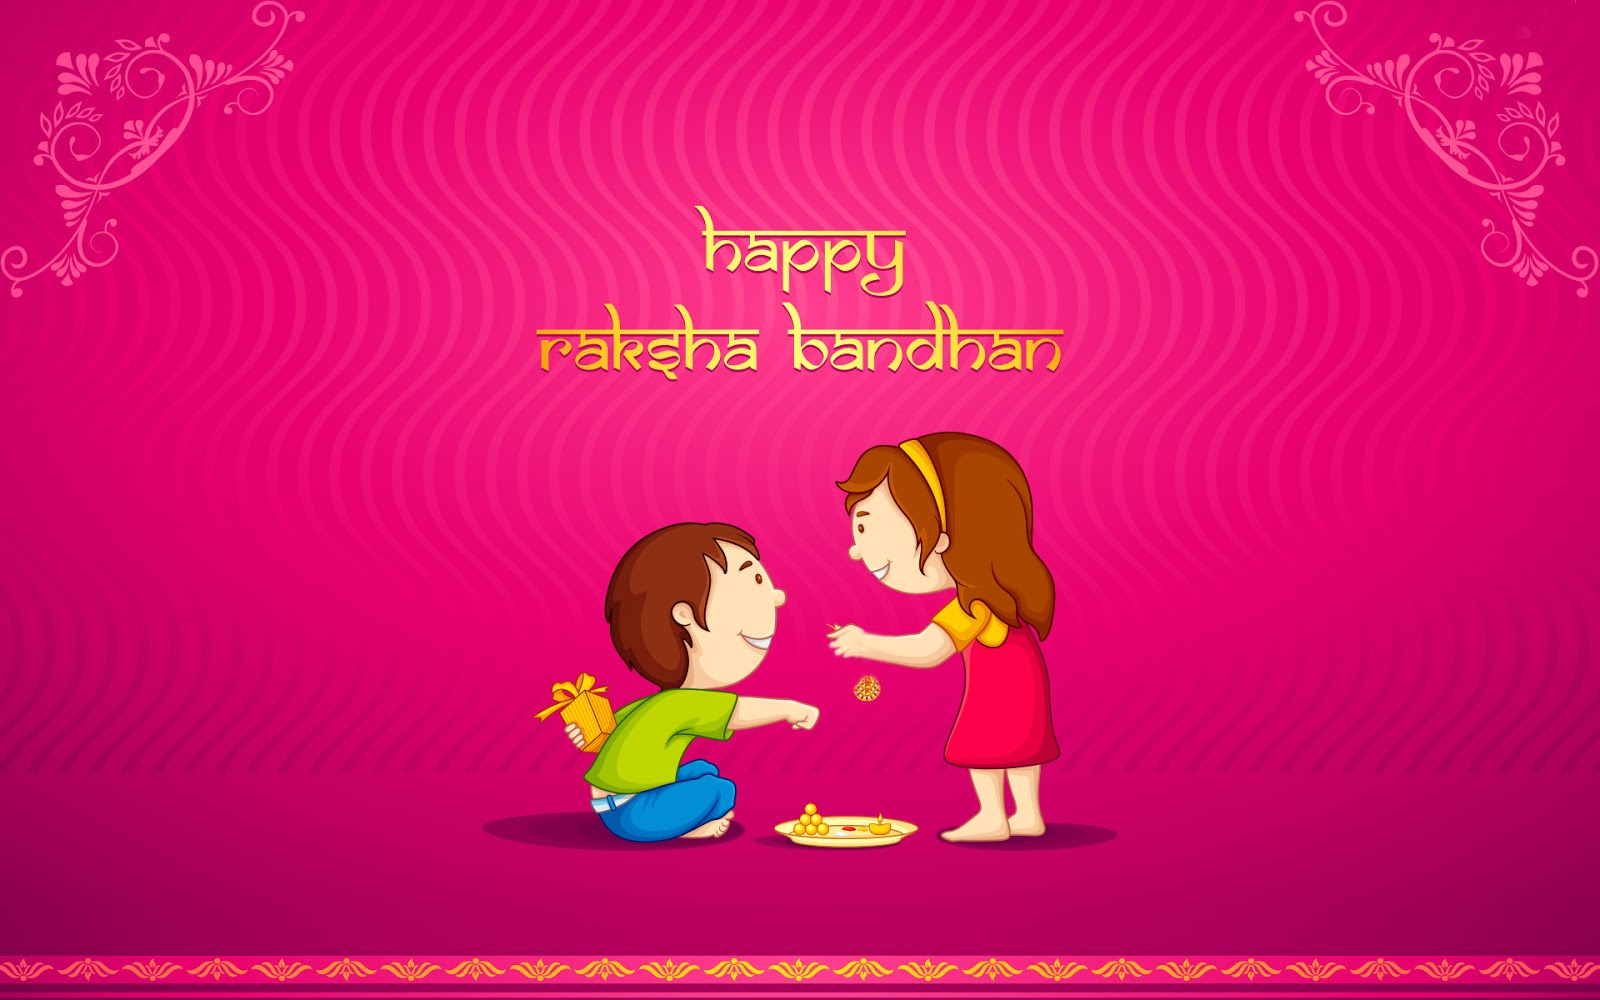 Wallpaper download 2017 - Raksha Bandhan Images Wallpapers Hd Photos Pics For Whatsapp Dp 2017